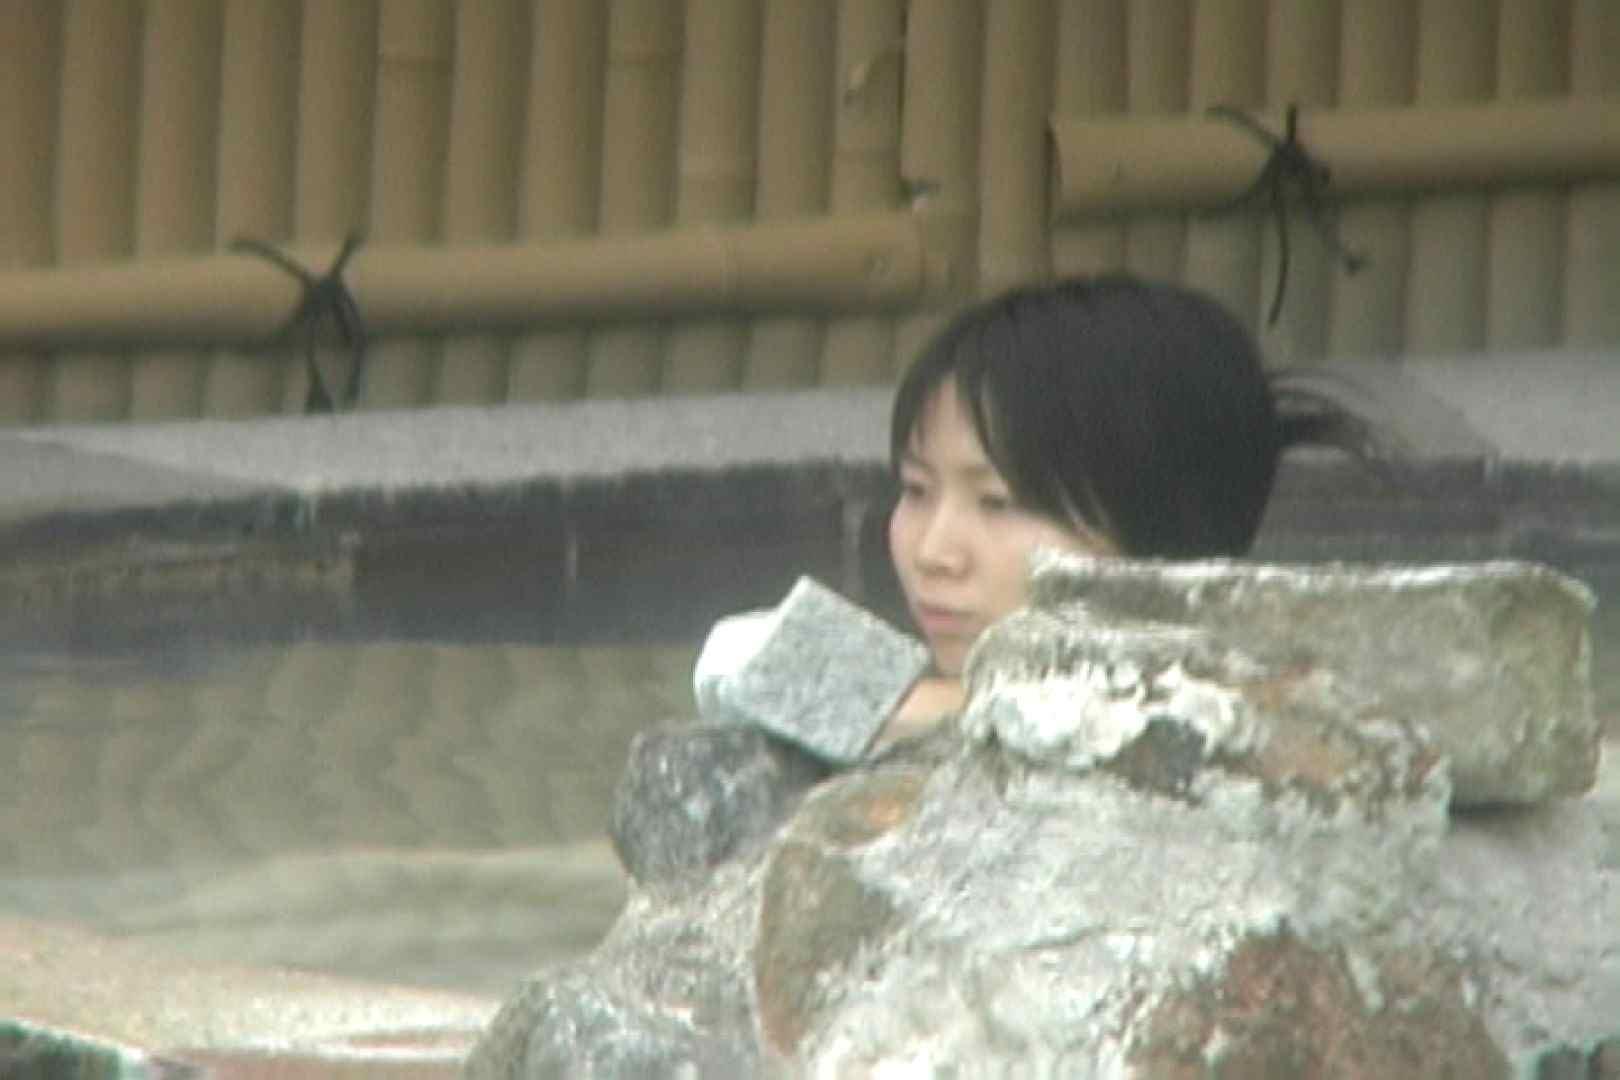 Aquaな露天風呂Vol.567 0 | 0  105連発 33